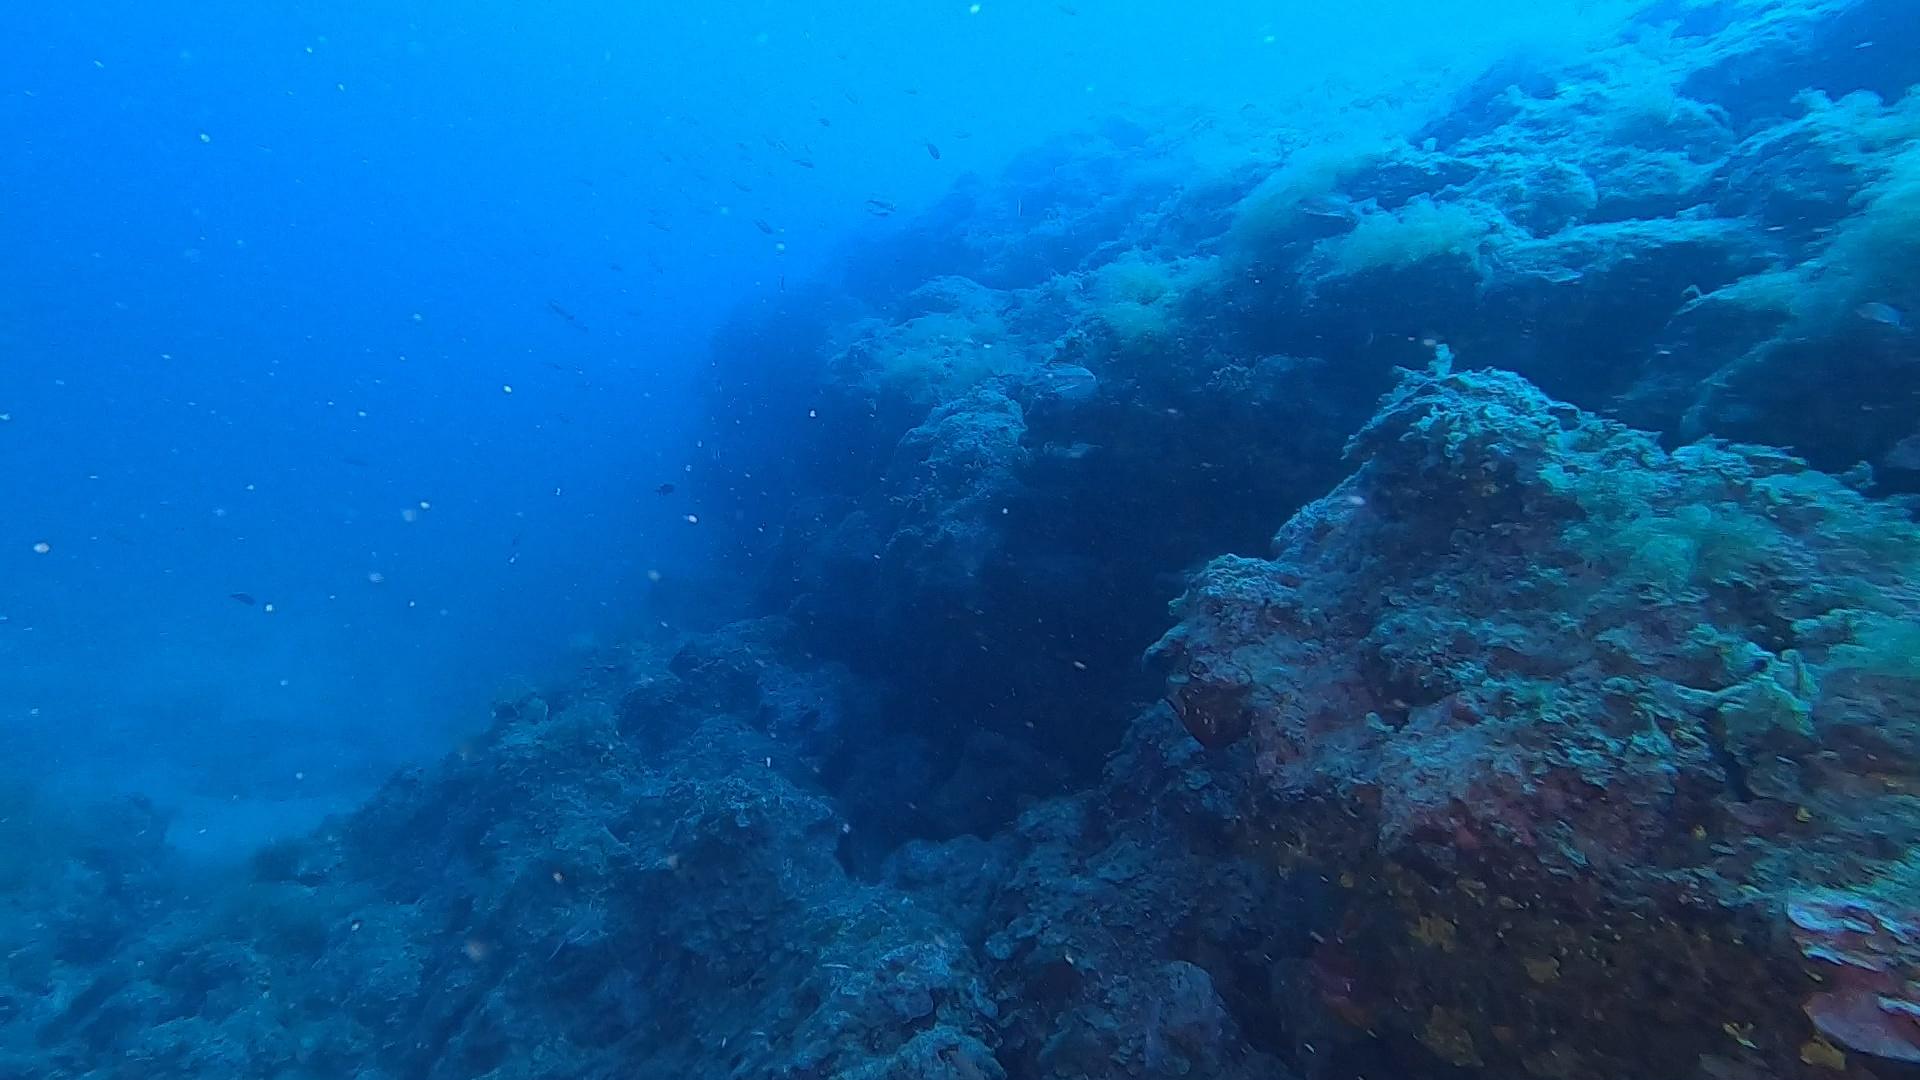 Aragosta Mediterranea Palinurus elephas Spiny lobster - Scogliera - Reef - intotheblue.it